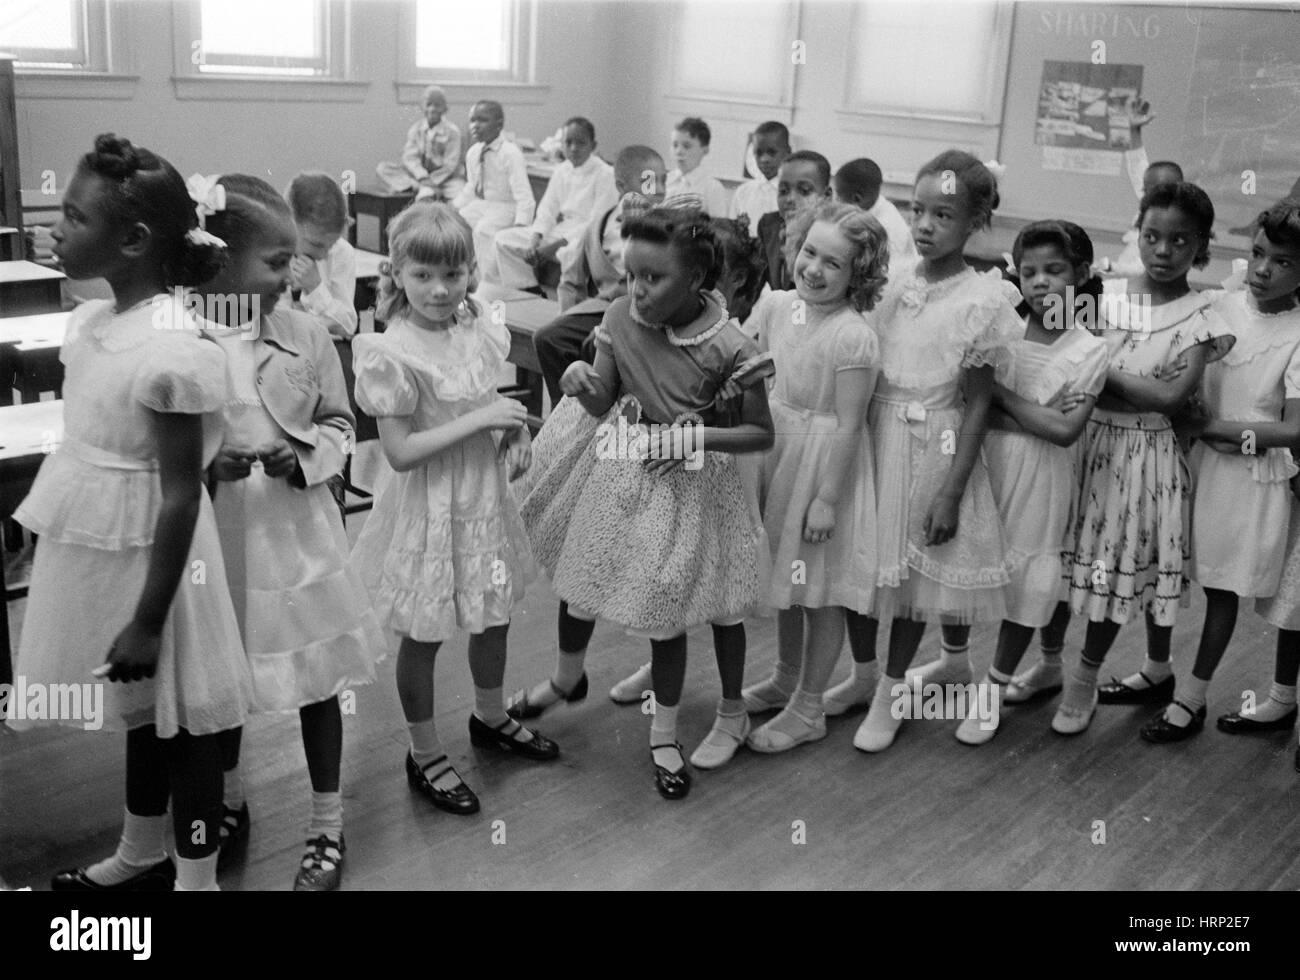 Integrated School, Washington DC, 1955 - Stock Image